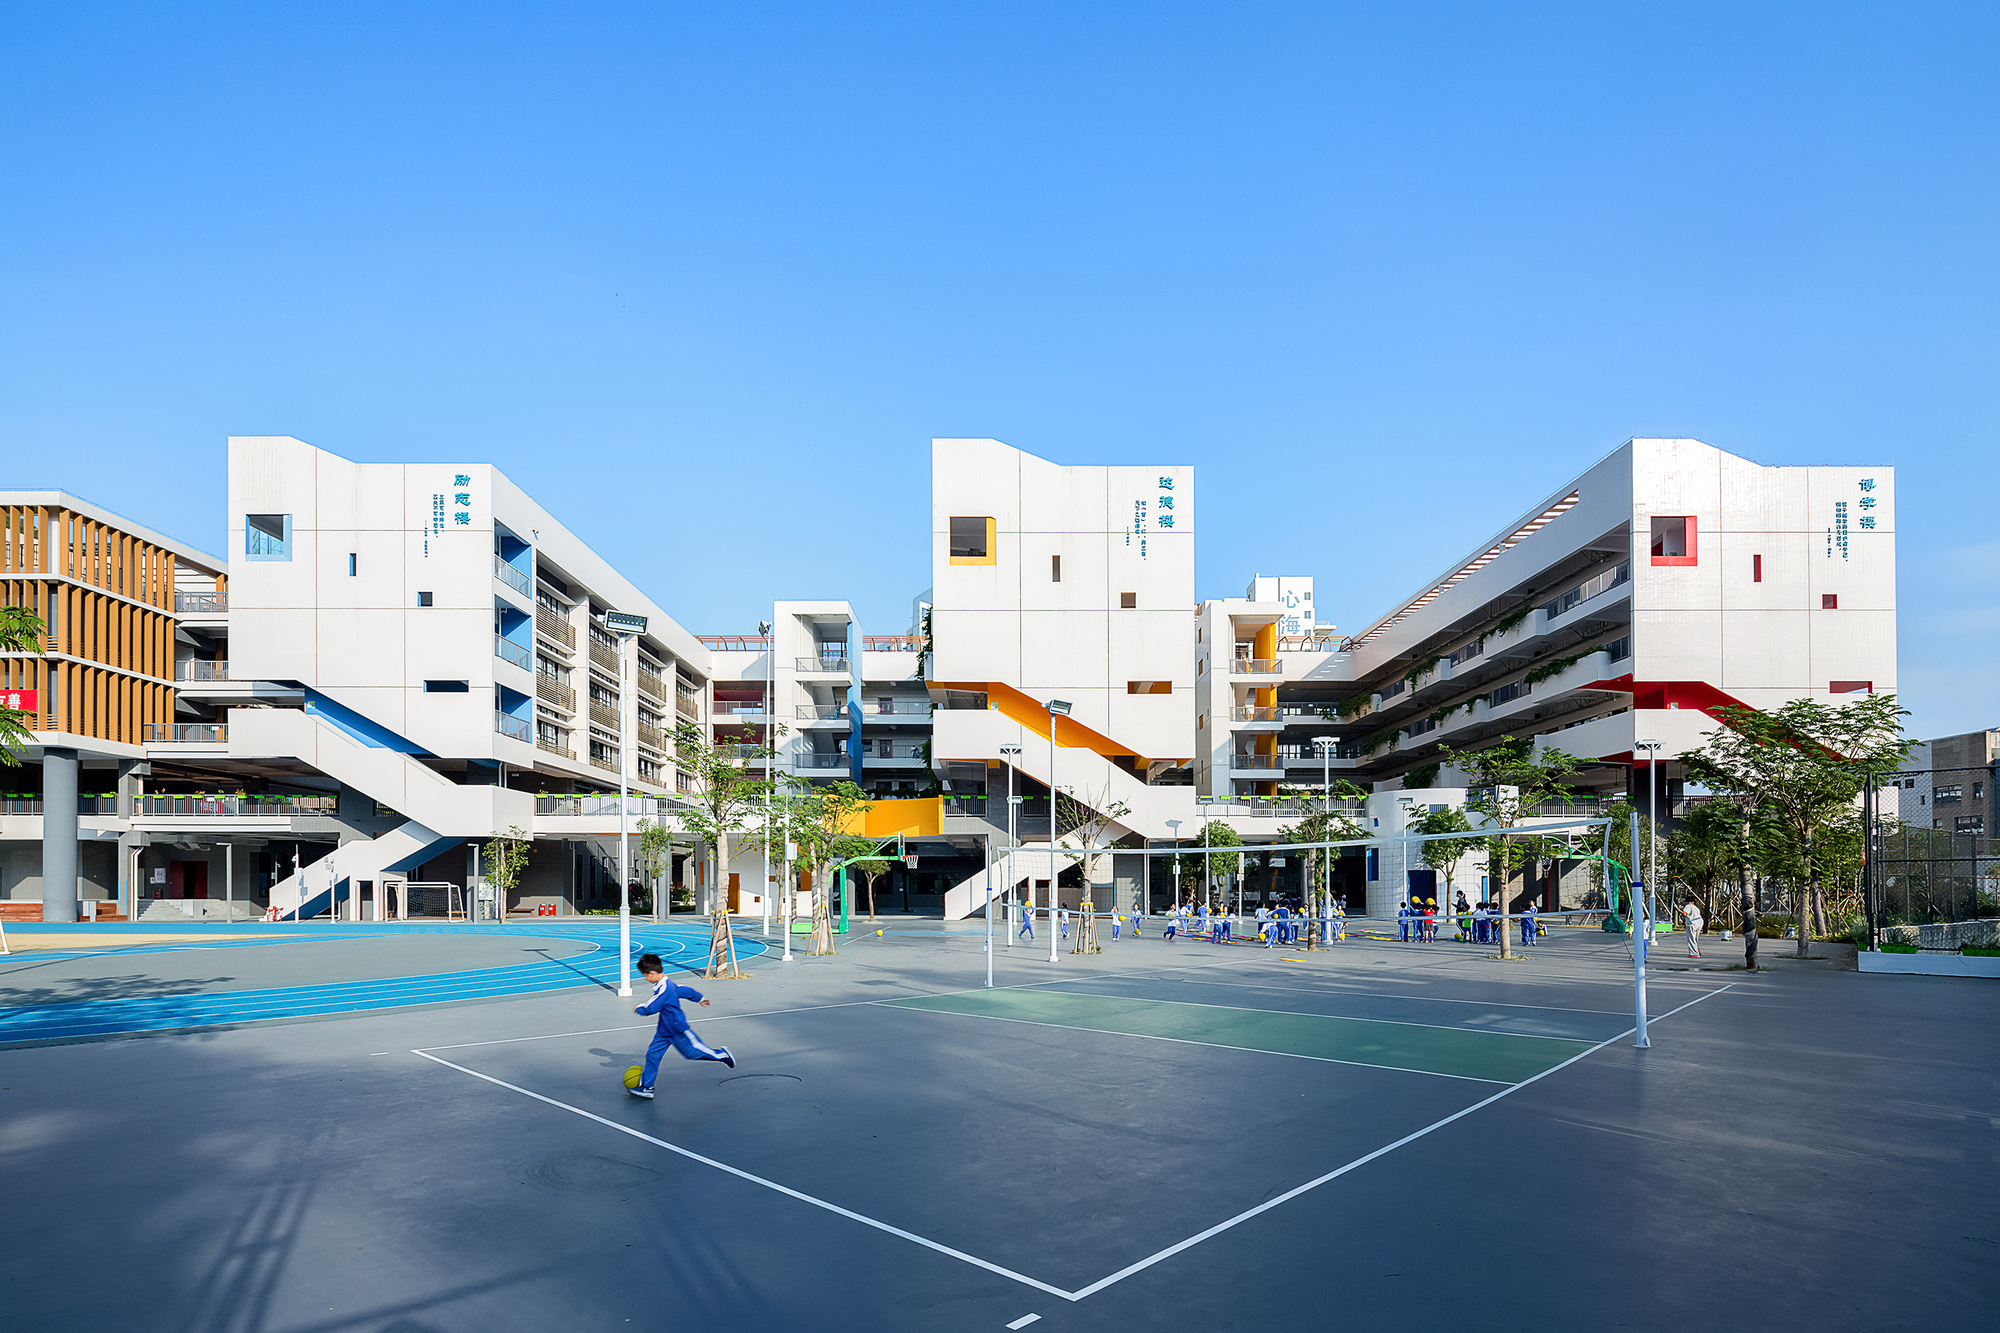 5  E字形教学楼 5  E shape teaching building jpg?1589766980.